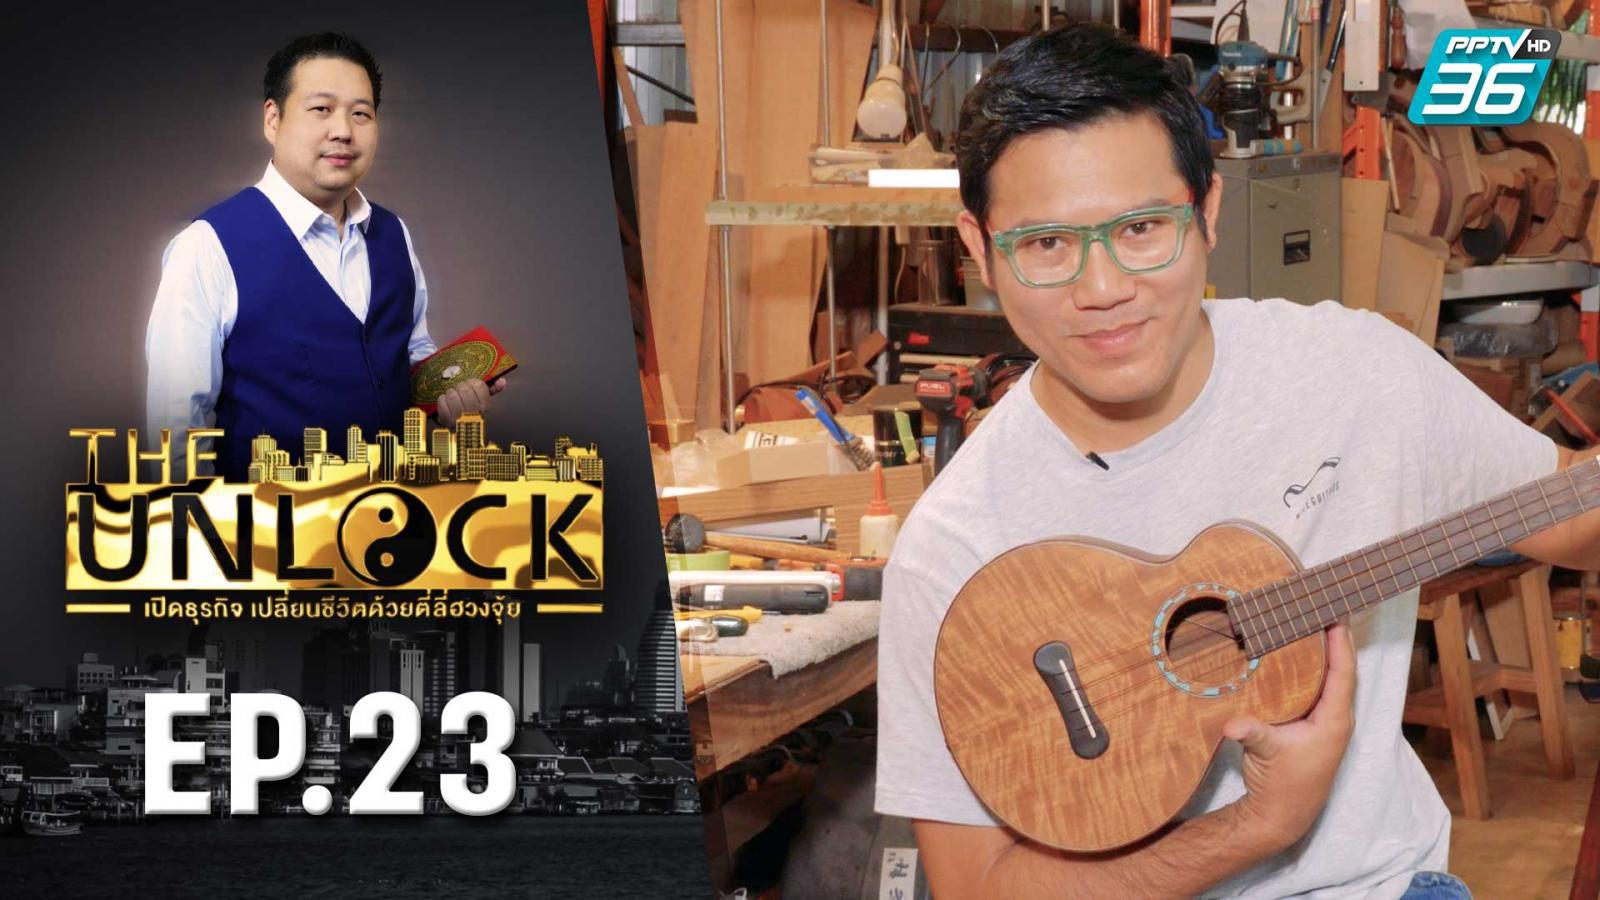 The Unlock เปิดธุรกิจ เปลี่ยนชีวิตด้วยตี่ลี่ฮวงจุ้ย | Mice Guitars EP.23 | PPTVHD 36